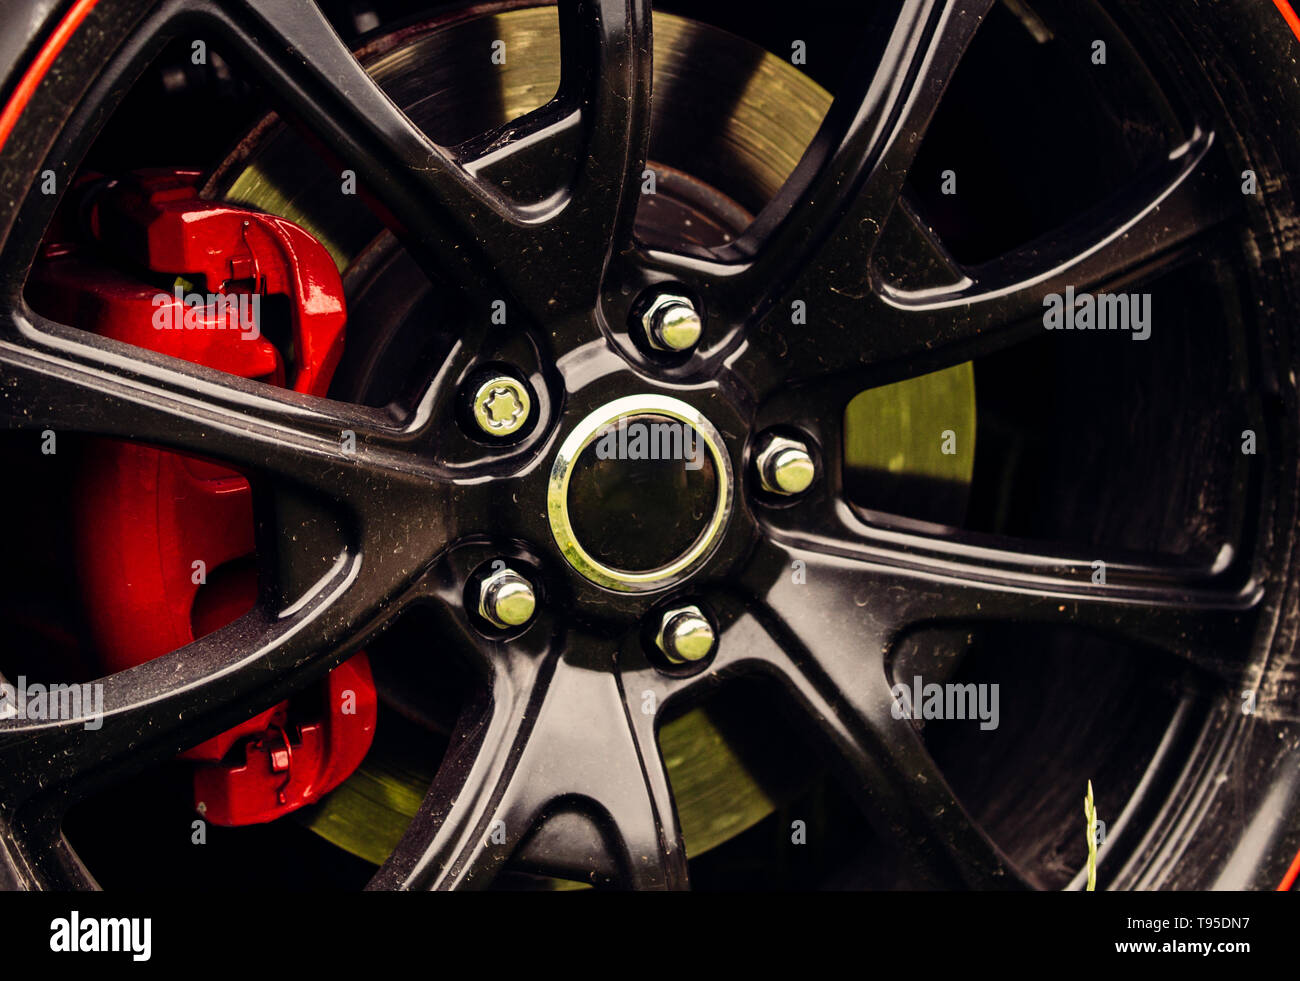 Drift inspired styling. Car wheel detail. Alloy wheel. Gloss black rim of luxury car wheel. Wheel and rim. Front or rear. Contemporary multi spoke - Stock Image